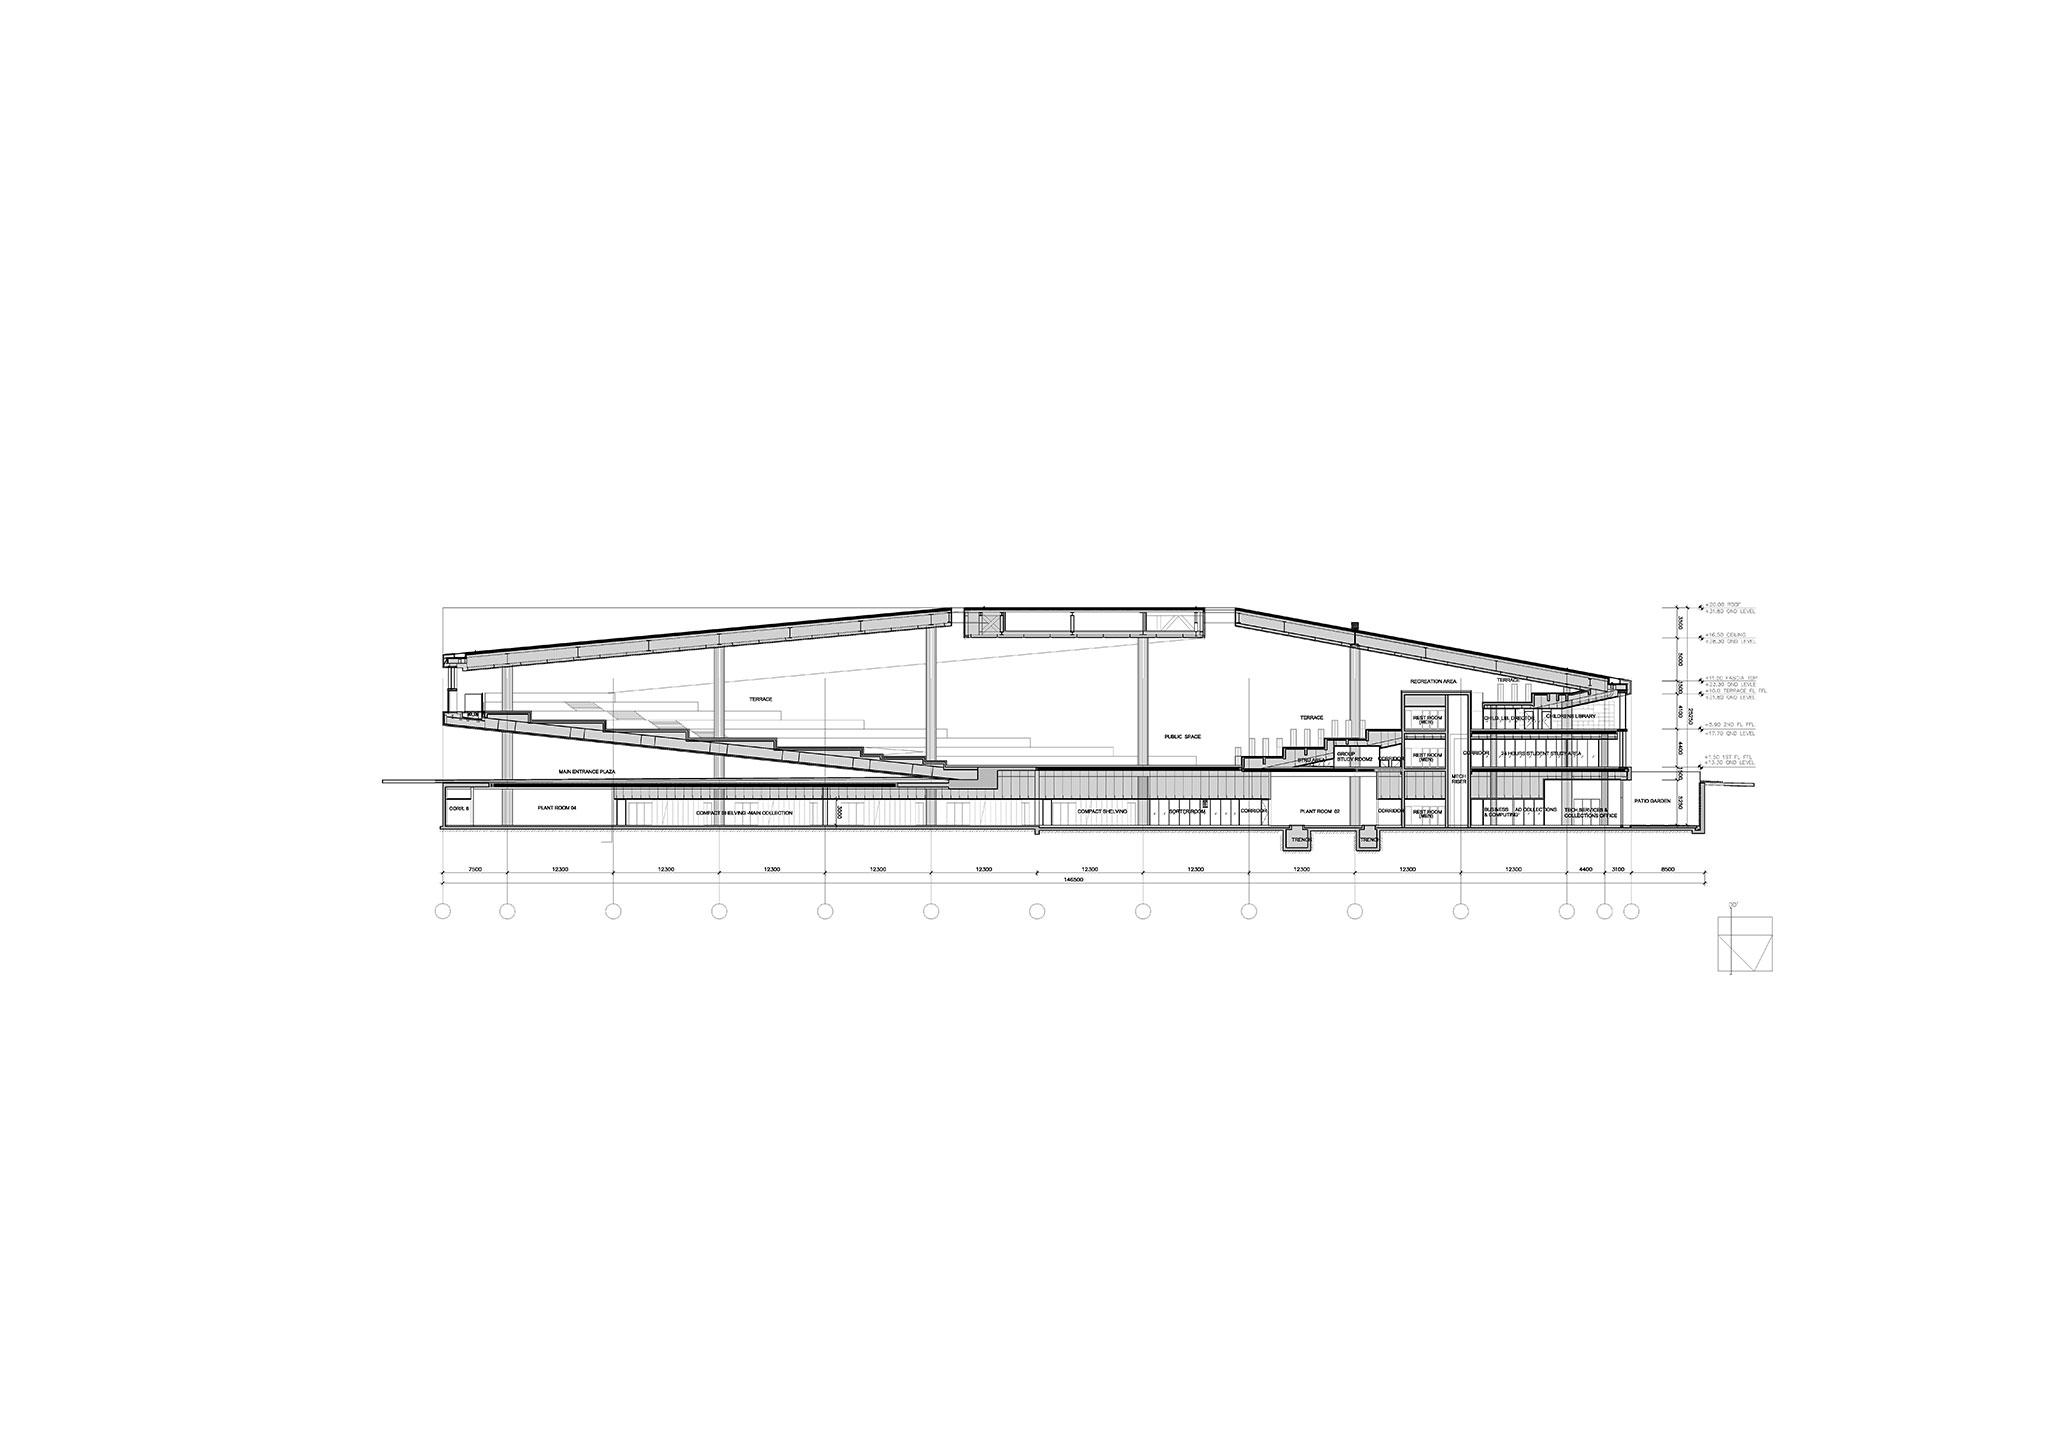 Omas qatar national library officially opened metalocus imagen cortesa de oma pooptronica Choice Image